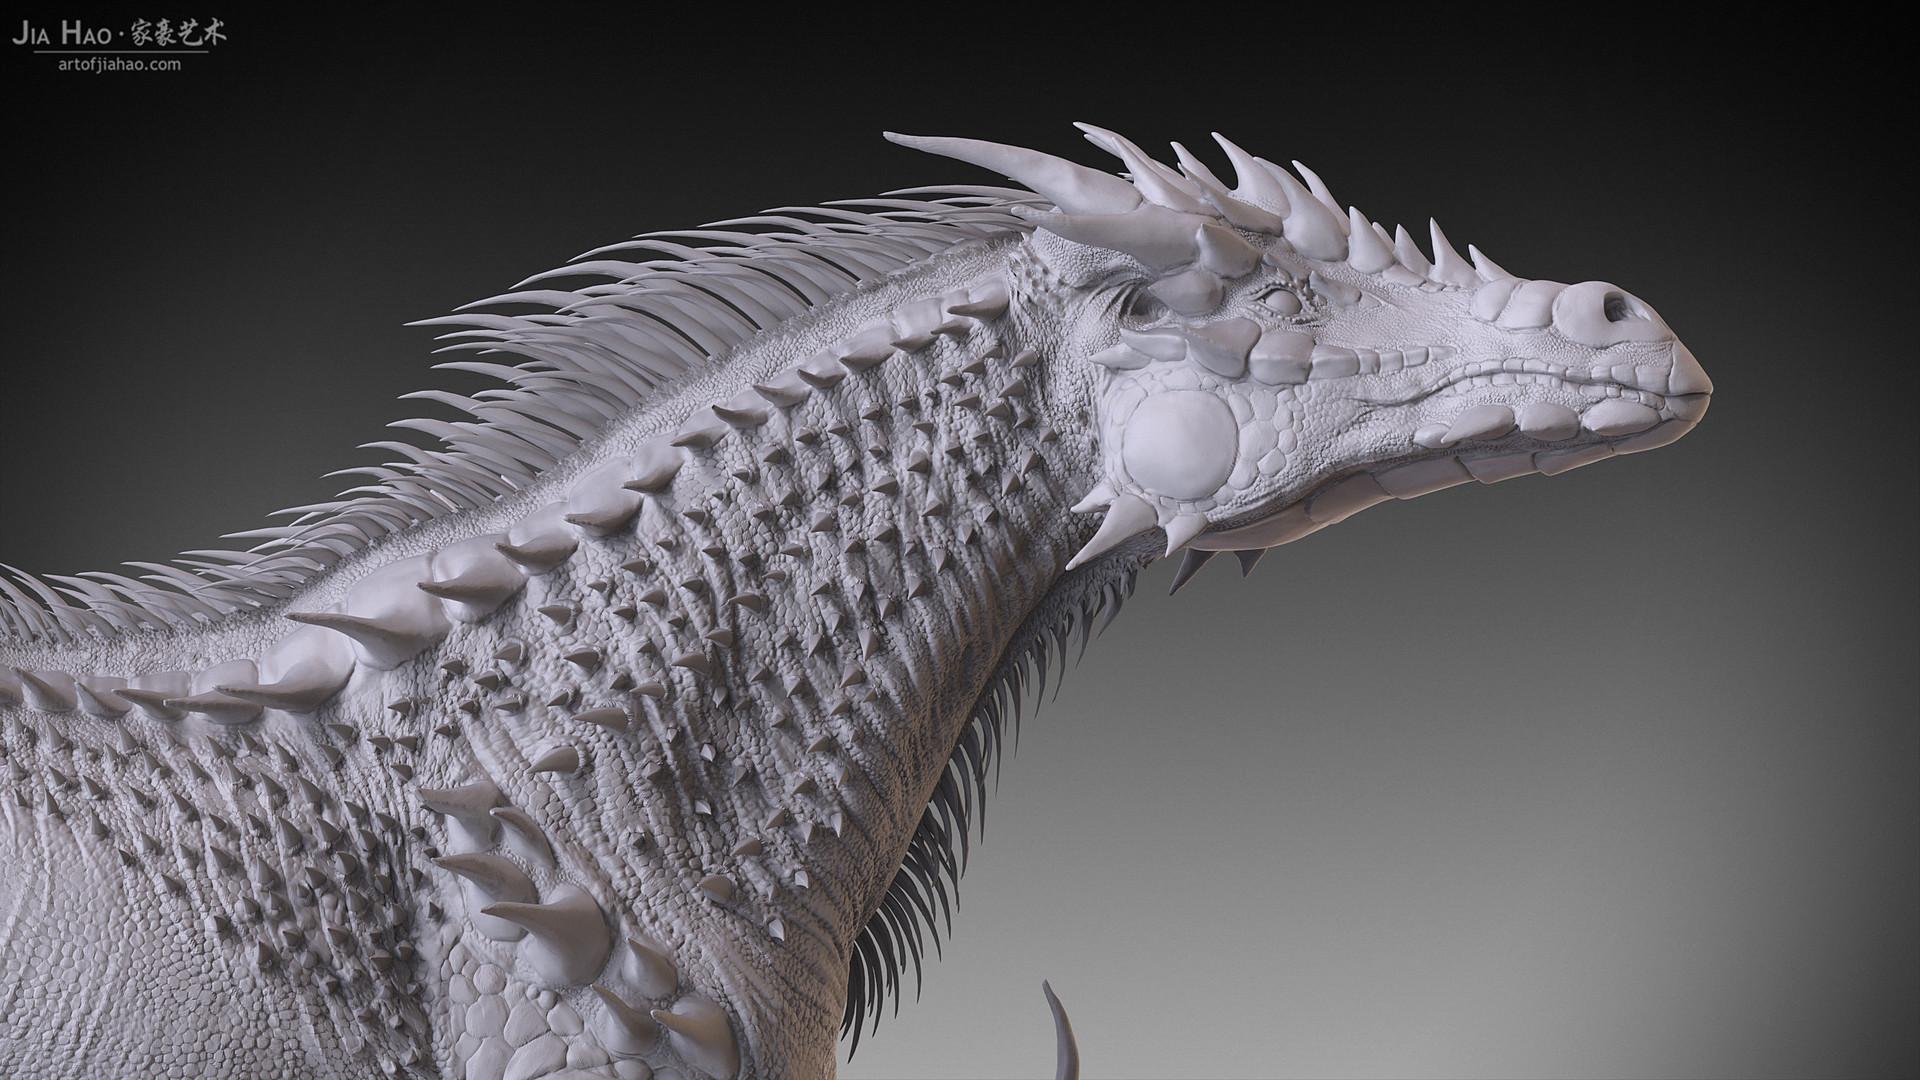 Jia hao dragonhorse 04